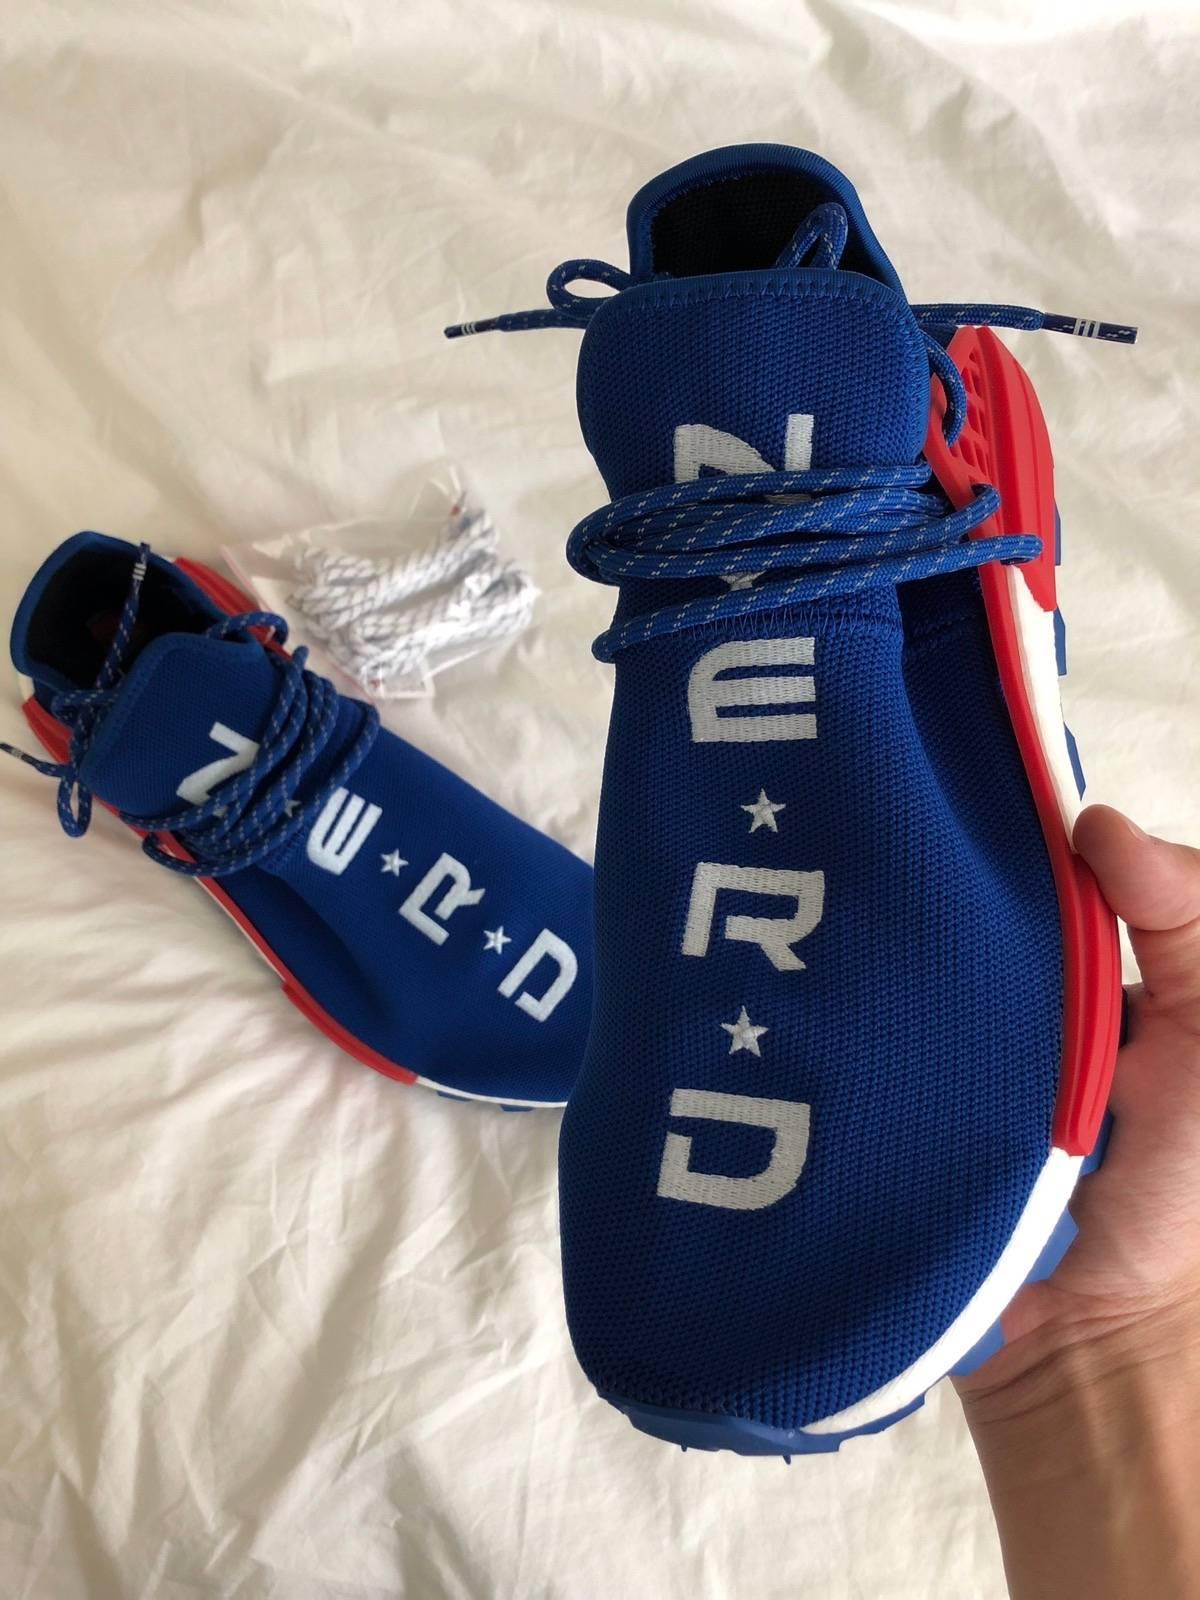 in stock 7cbb5 1ed24 Adidas × Pharrell Pharrell X Adidas Nmd Human Race N.E.R.D Blue Red Size  10.5 $600